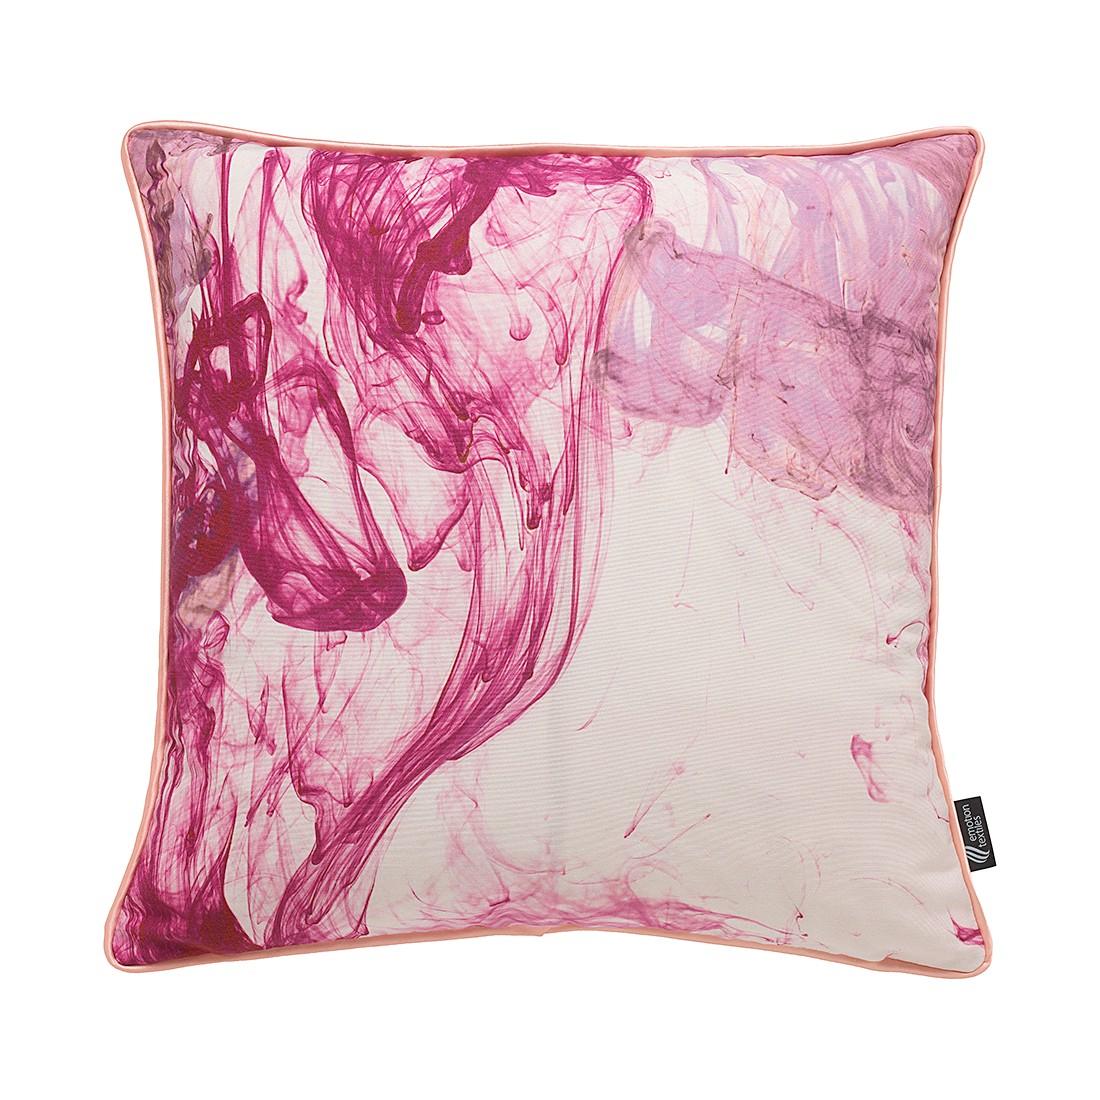 Kissenhülle Storm of Colours – Pink, emotion textiles günstig bestellen